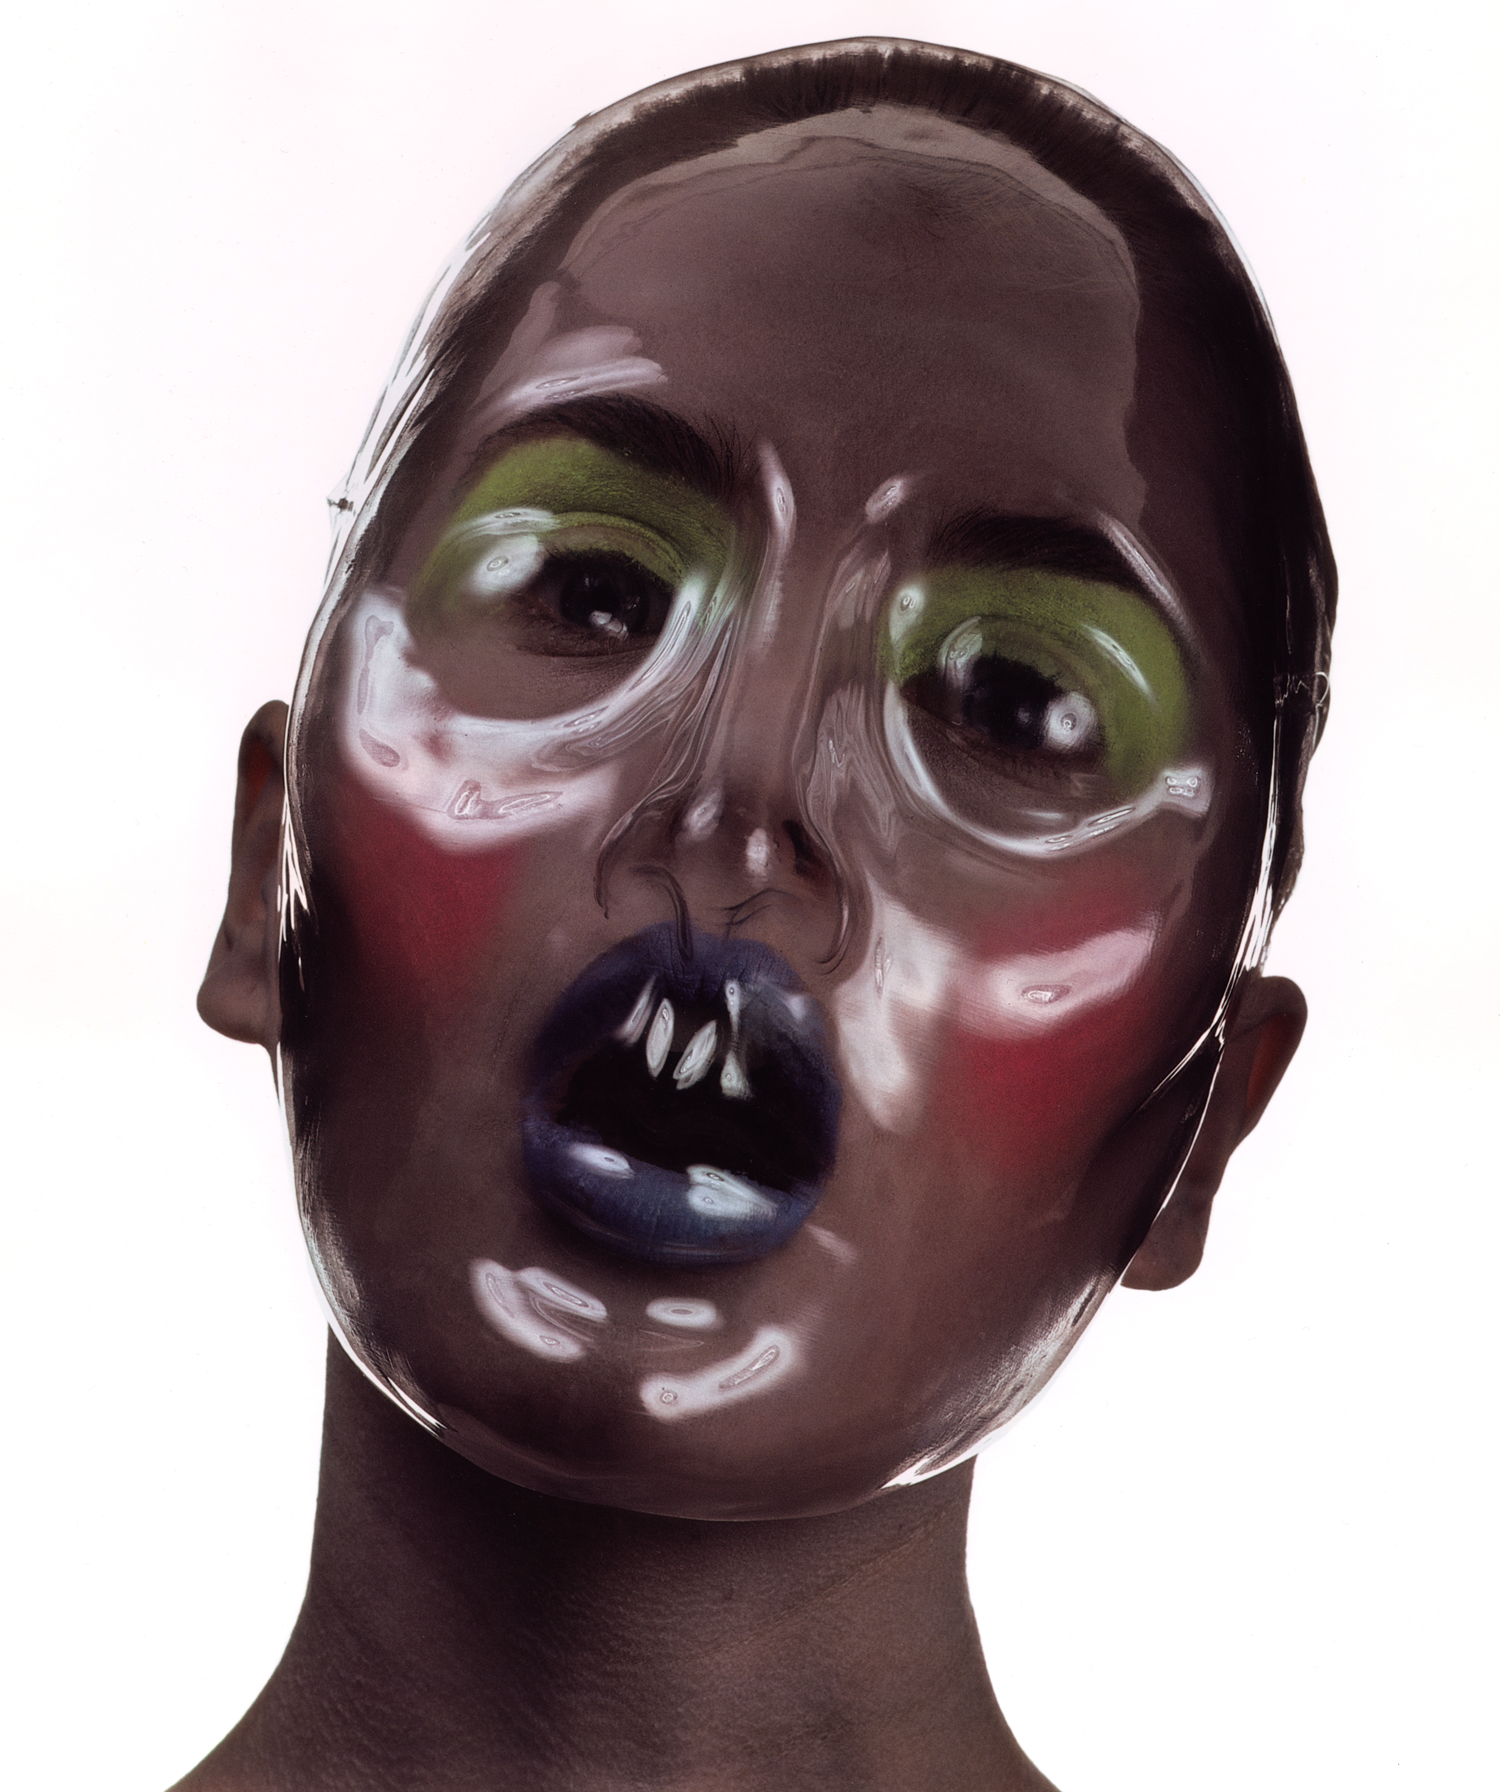 Clear Plastic Beauty Mask , New York, 1996 Dye transfer print © The Irving Penn Foundation